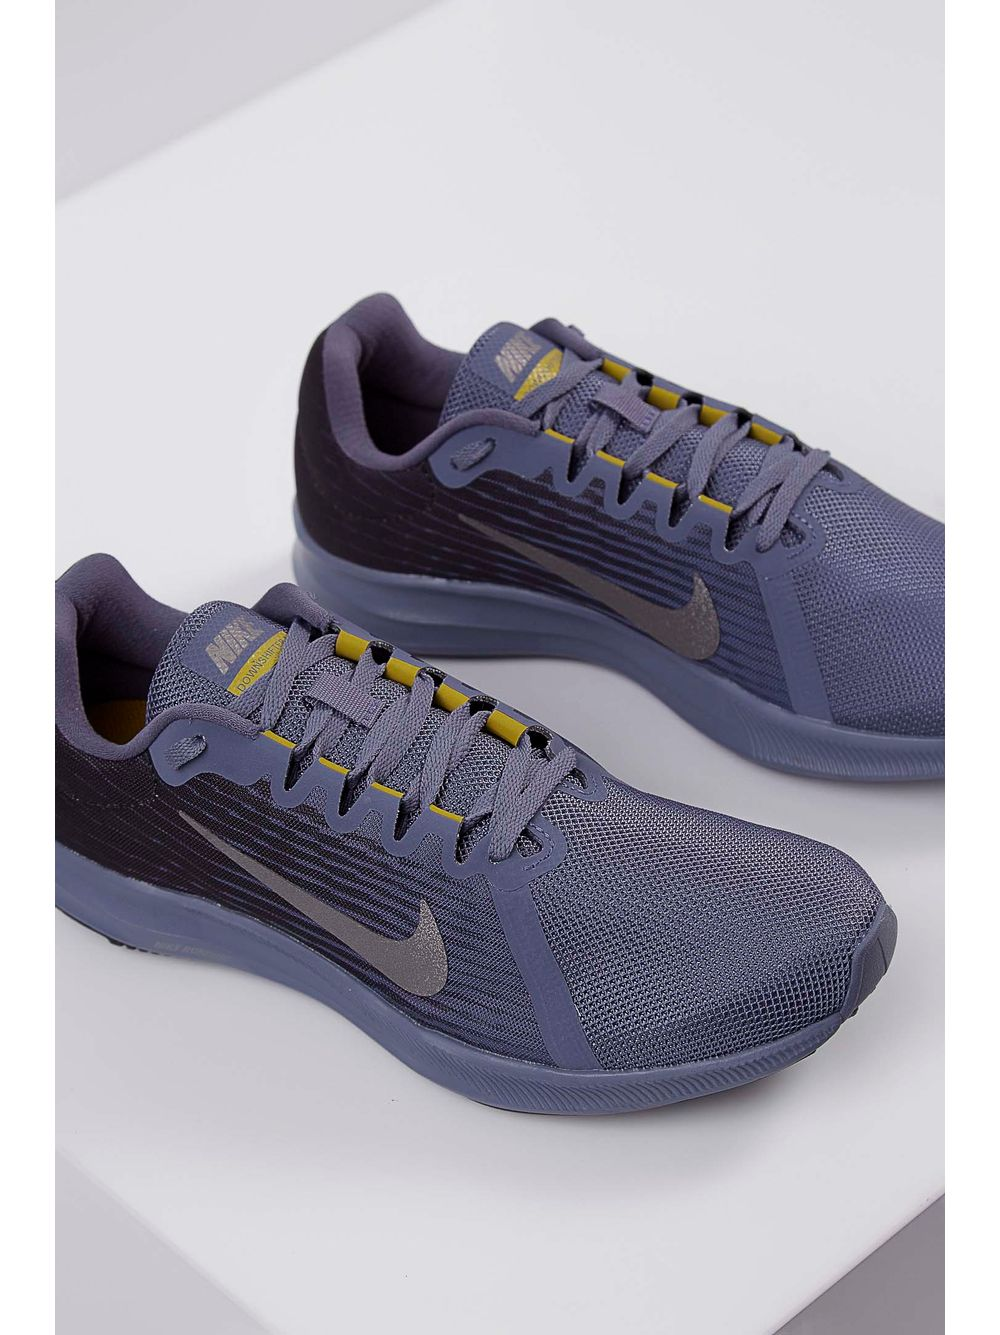 d868a233e6a Previous. Tenis-Corrida-Nike-Downshifter-Marinho ...